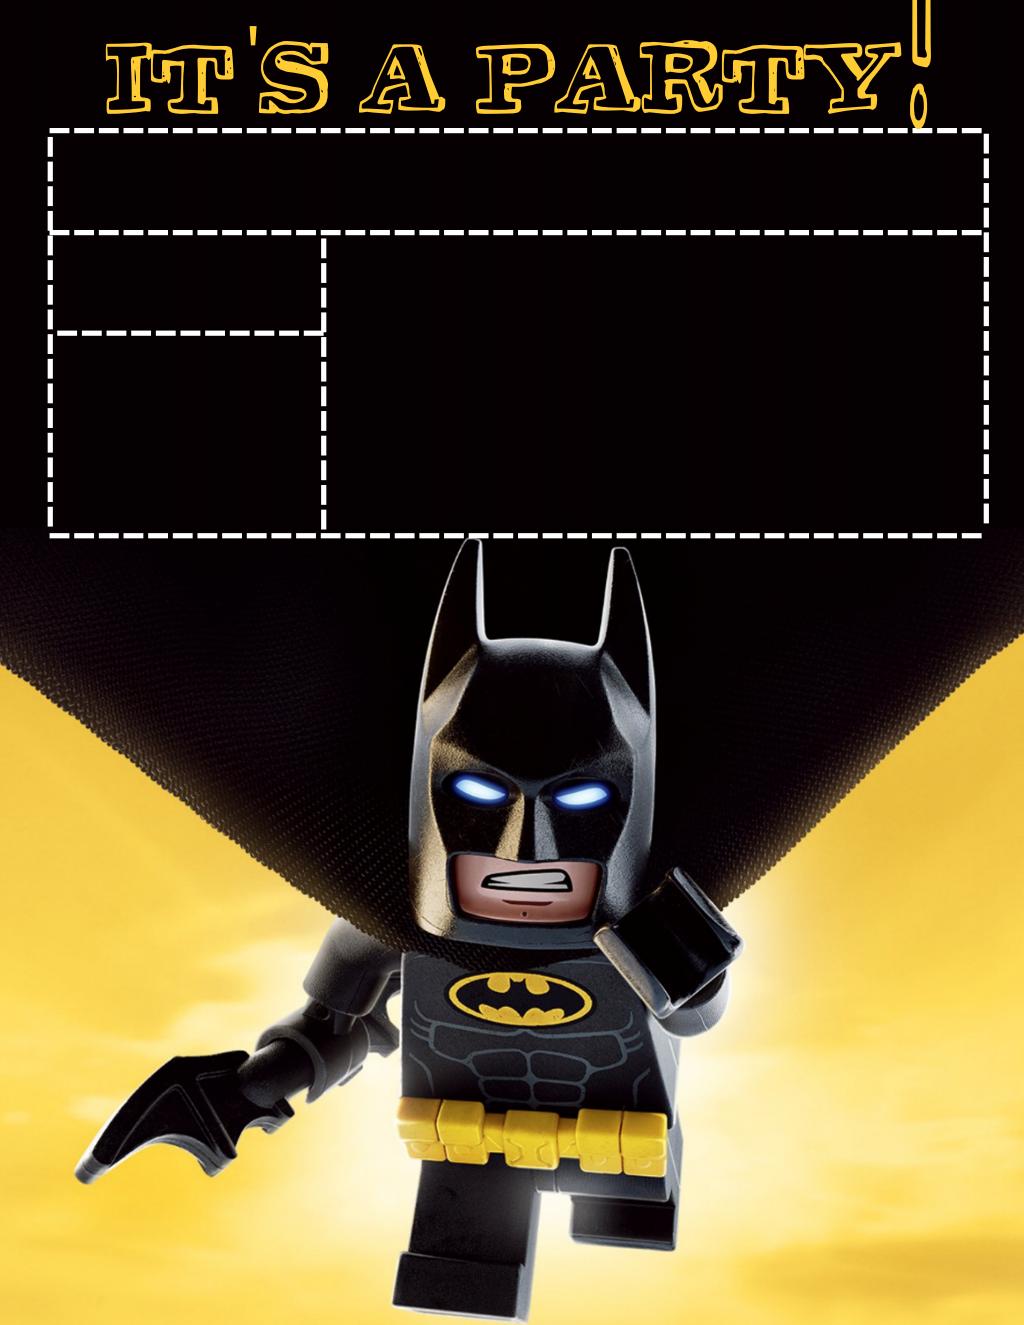 Lego Batman Invitation Pdf Google Drive Batman Invitations Lego Batman Party Lego Batman Birthday